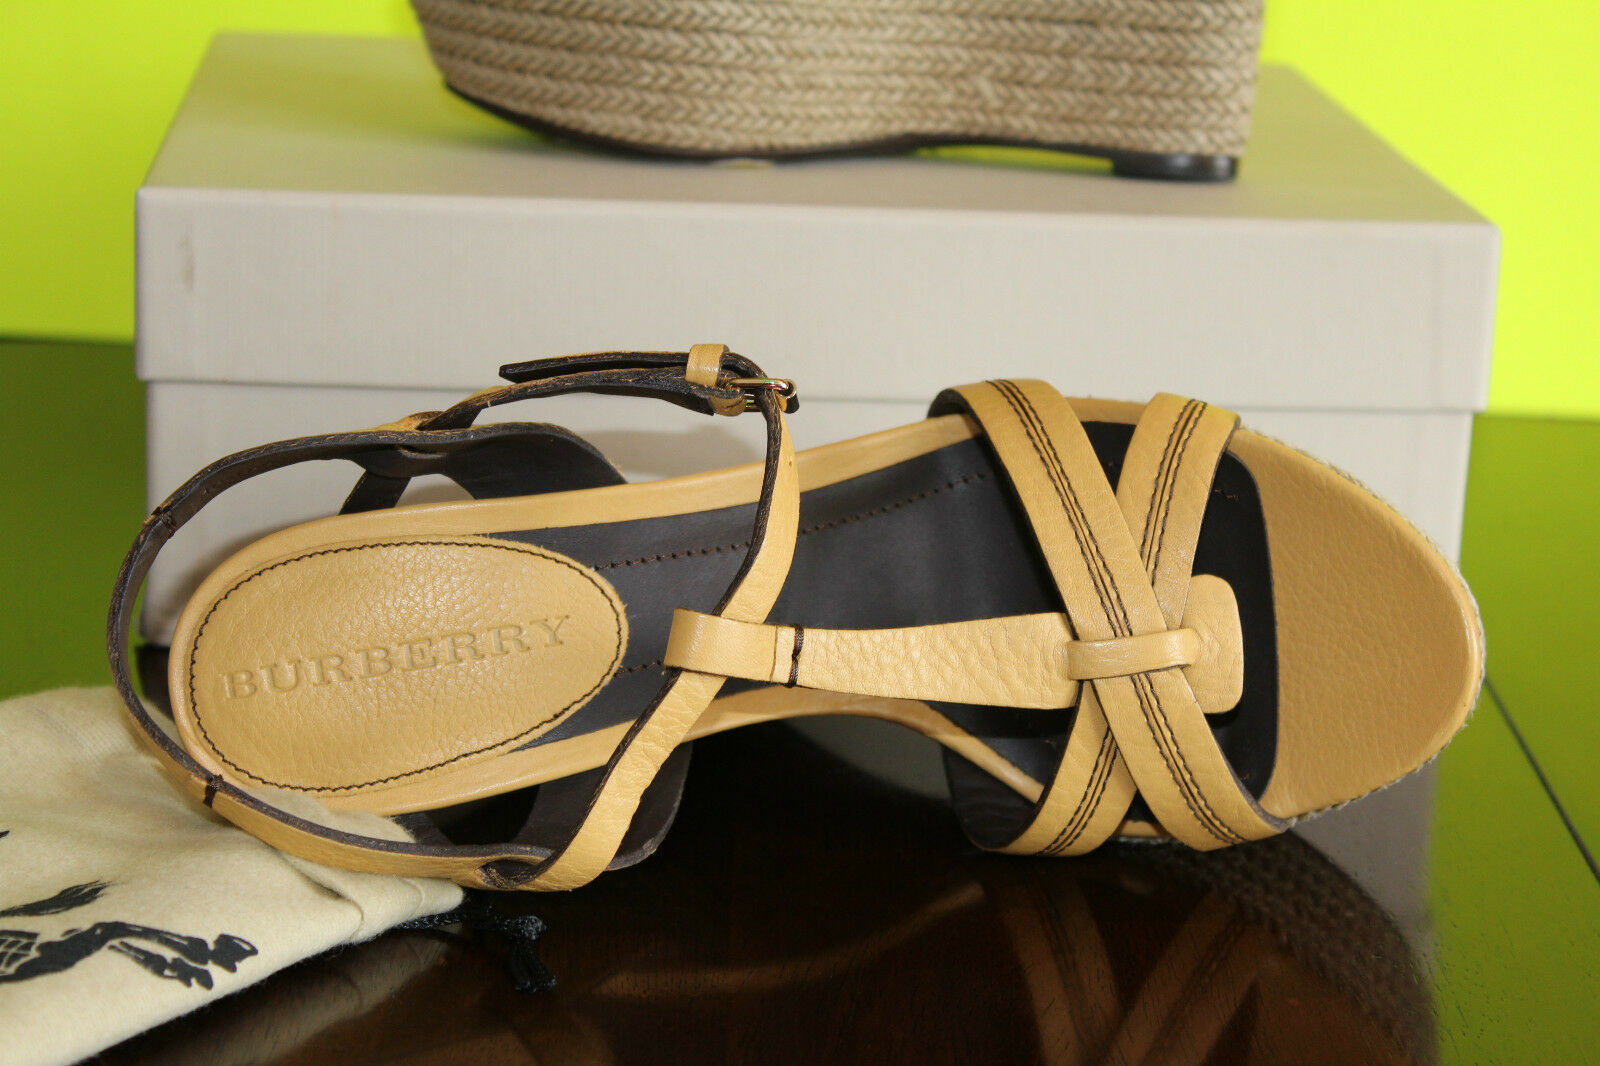 Burberry Tweed Tweed Burberry Cuero Plataforma Alpargata Amarillo  10us  551 36e194